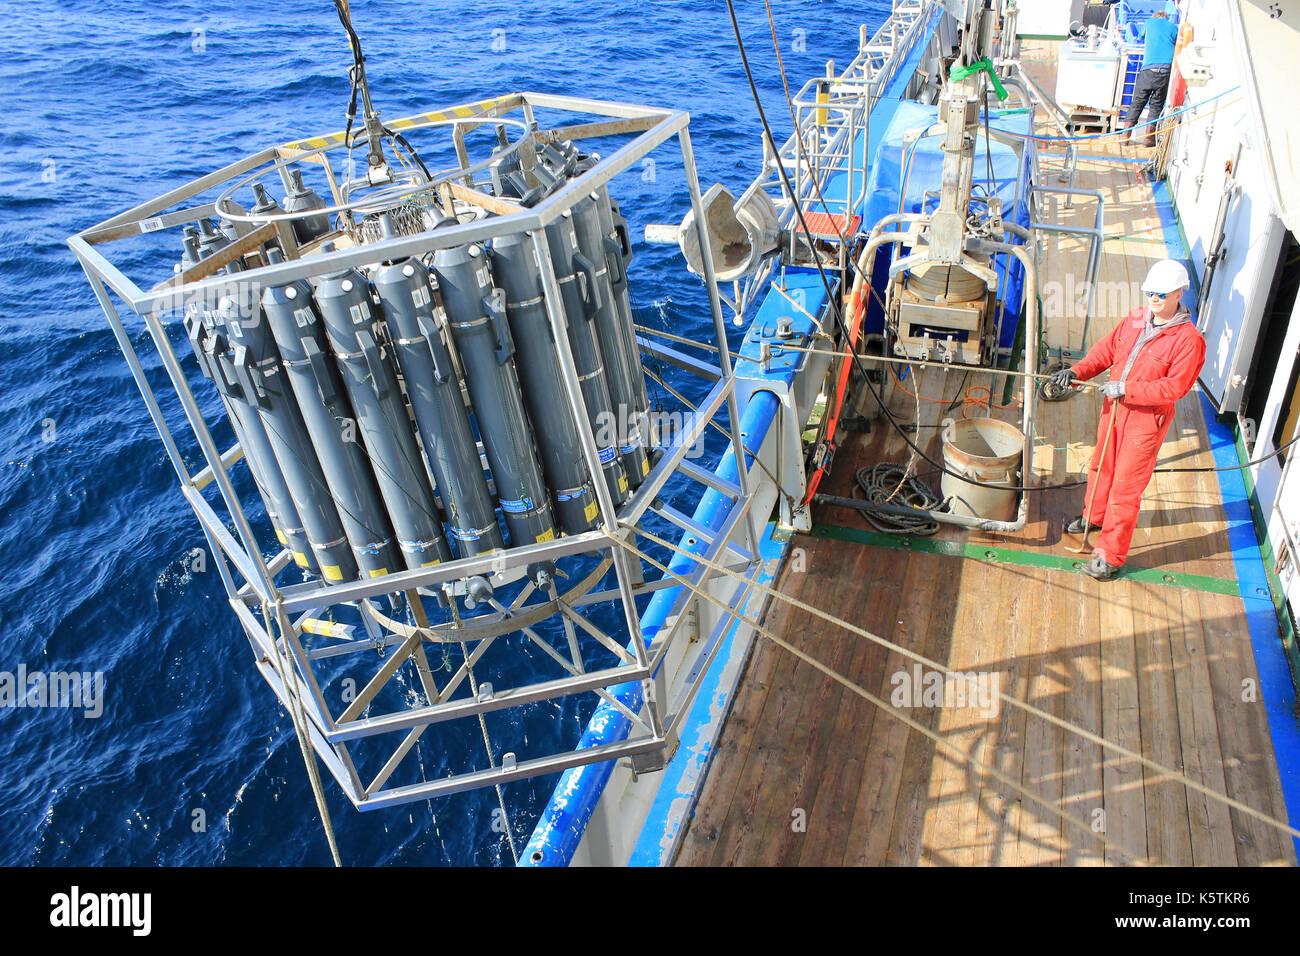 Deploying a CTD Rosette for sampling water Conductivity, Temperature, Depth - Stock Image